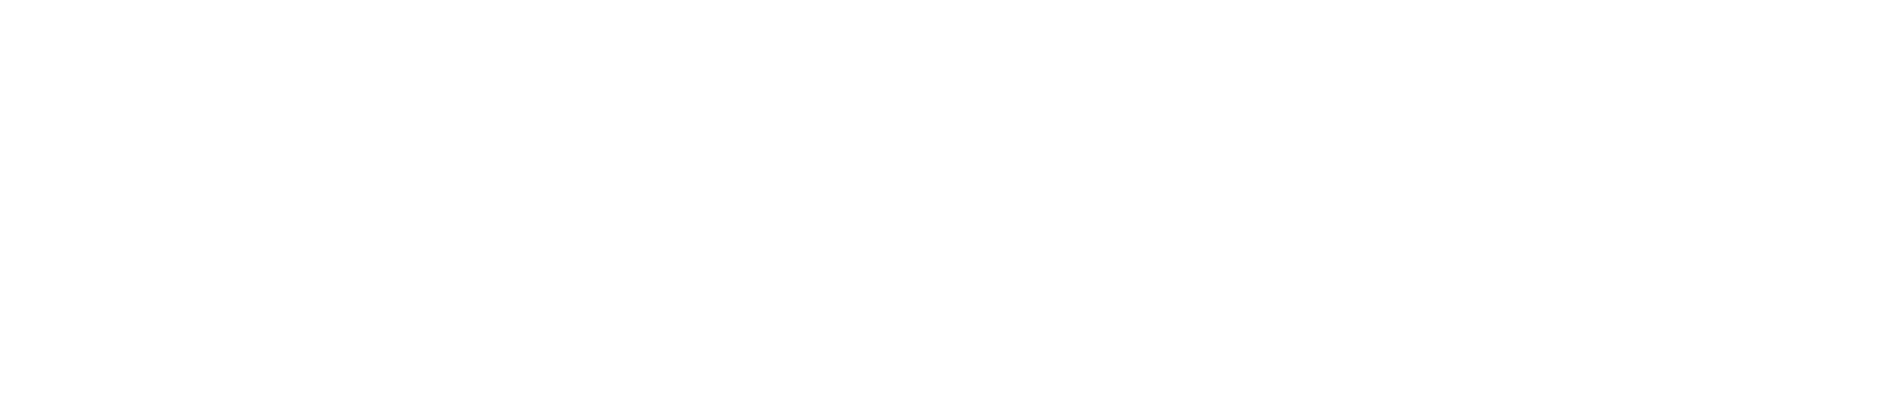 Beauty Academy Gdynia